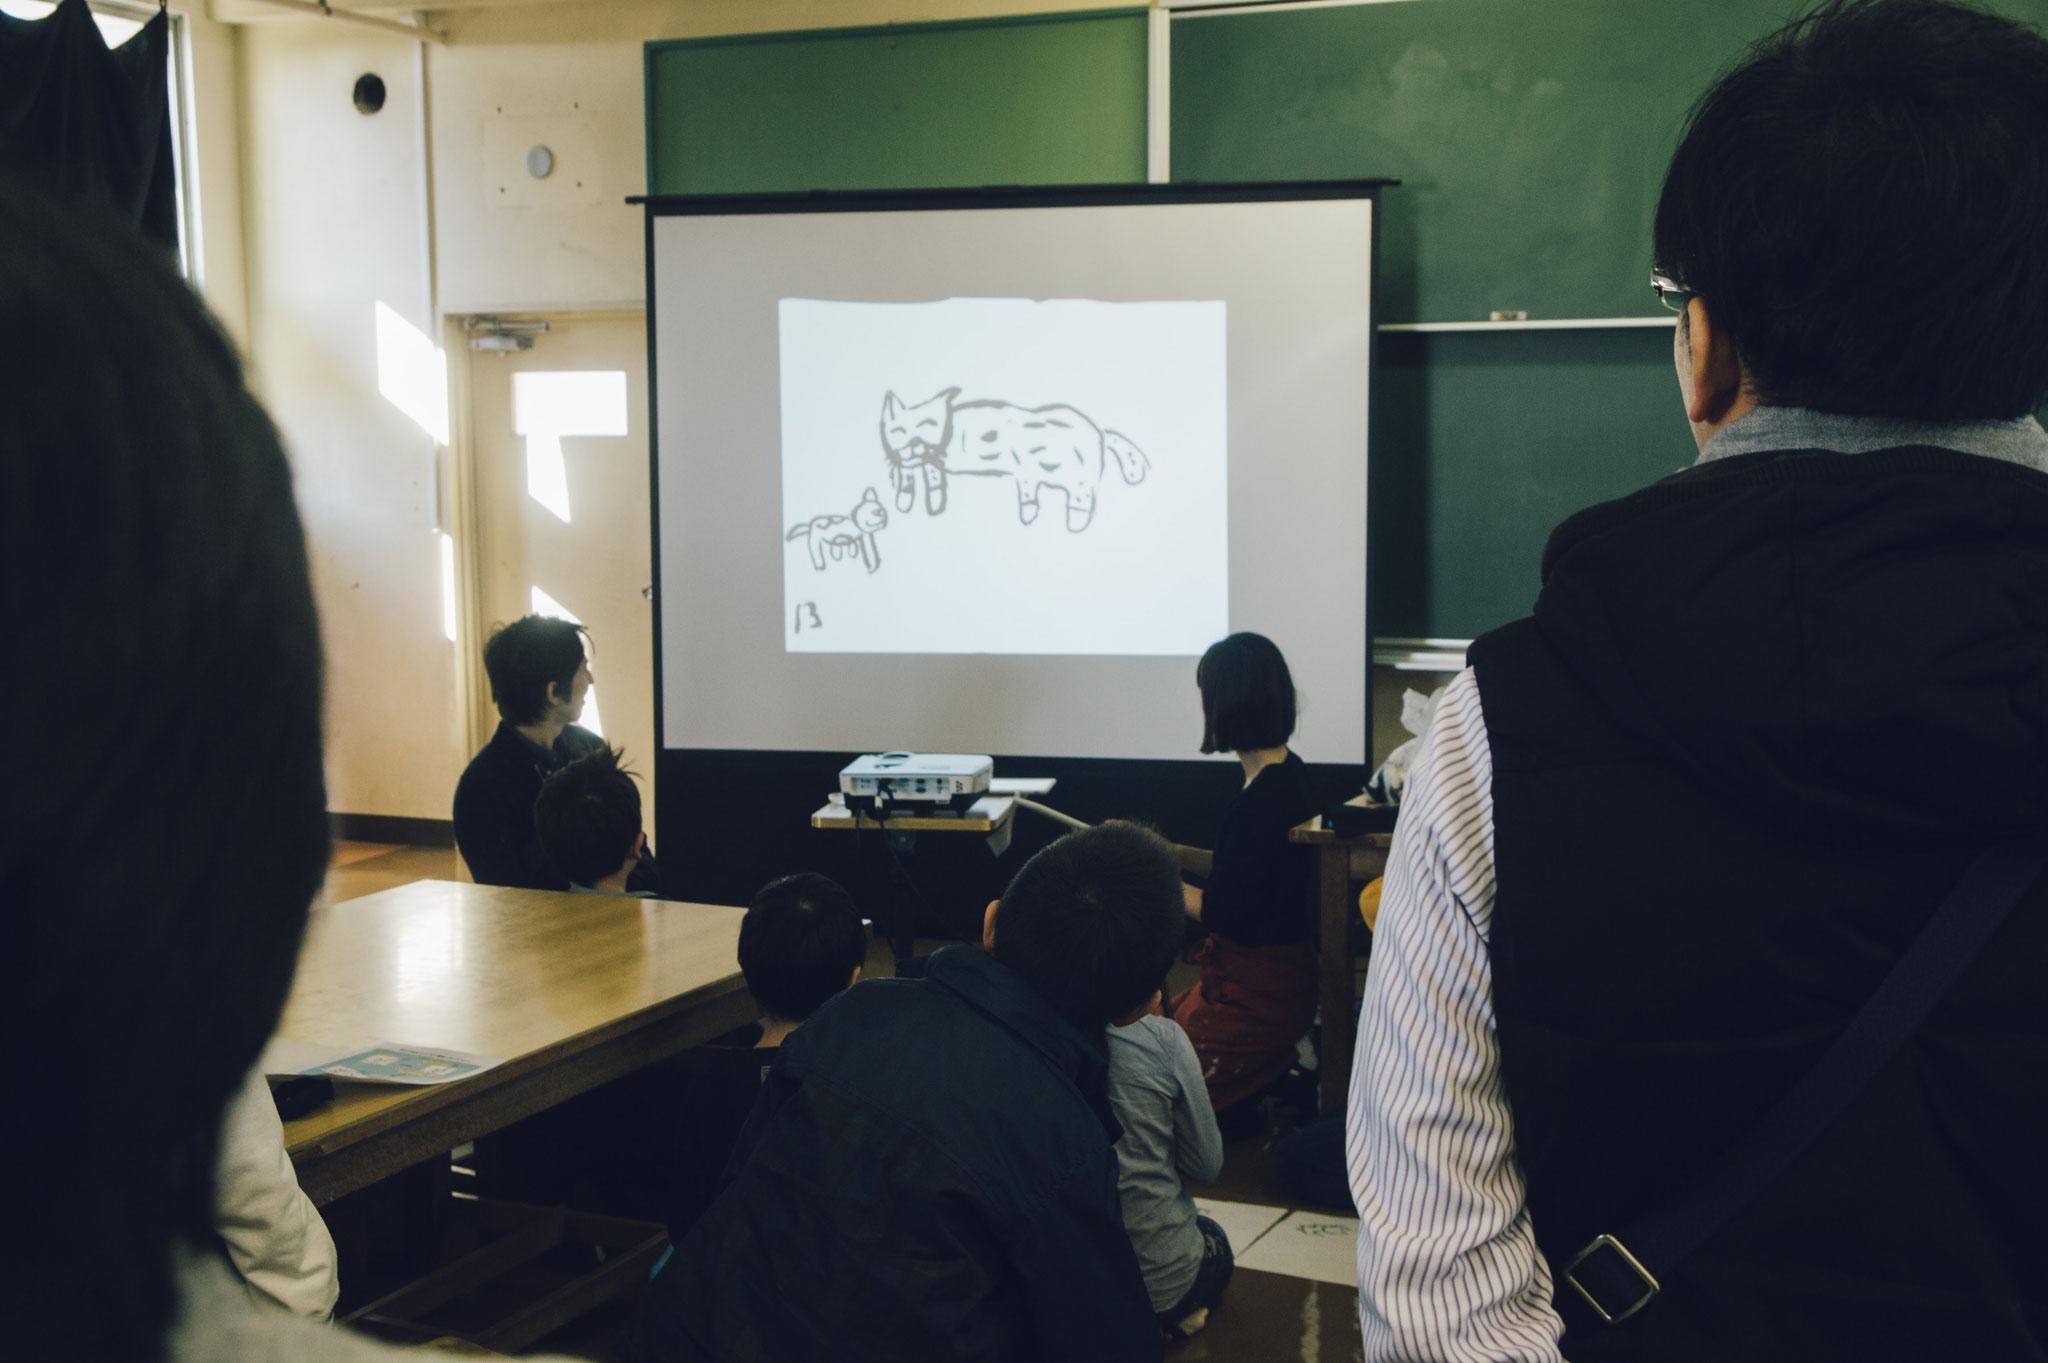 iPadと習字セットをつかったデジタルワークショップ。簡単にパラパラ漫画がつくれます。最後は同じ席の子のアニメと繋げて大作に!(子供/2時間半)主催:千葉市メディア芸術振興事業実行委員会/ななめな学校